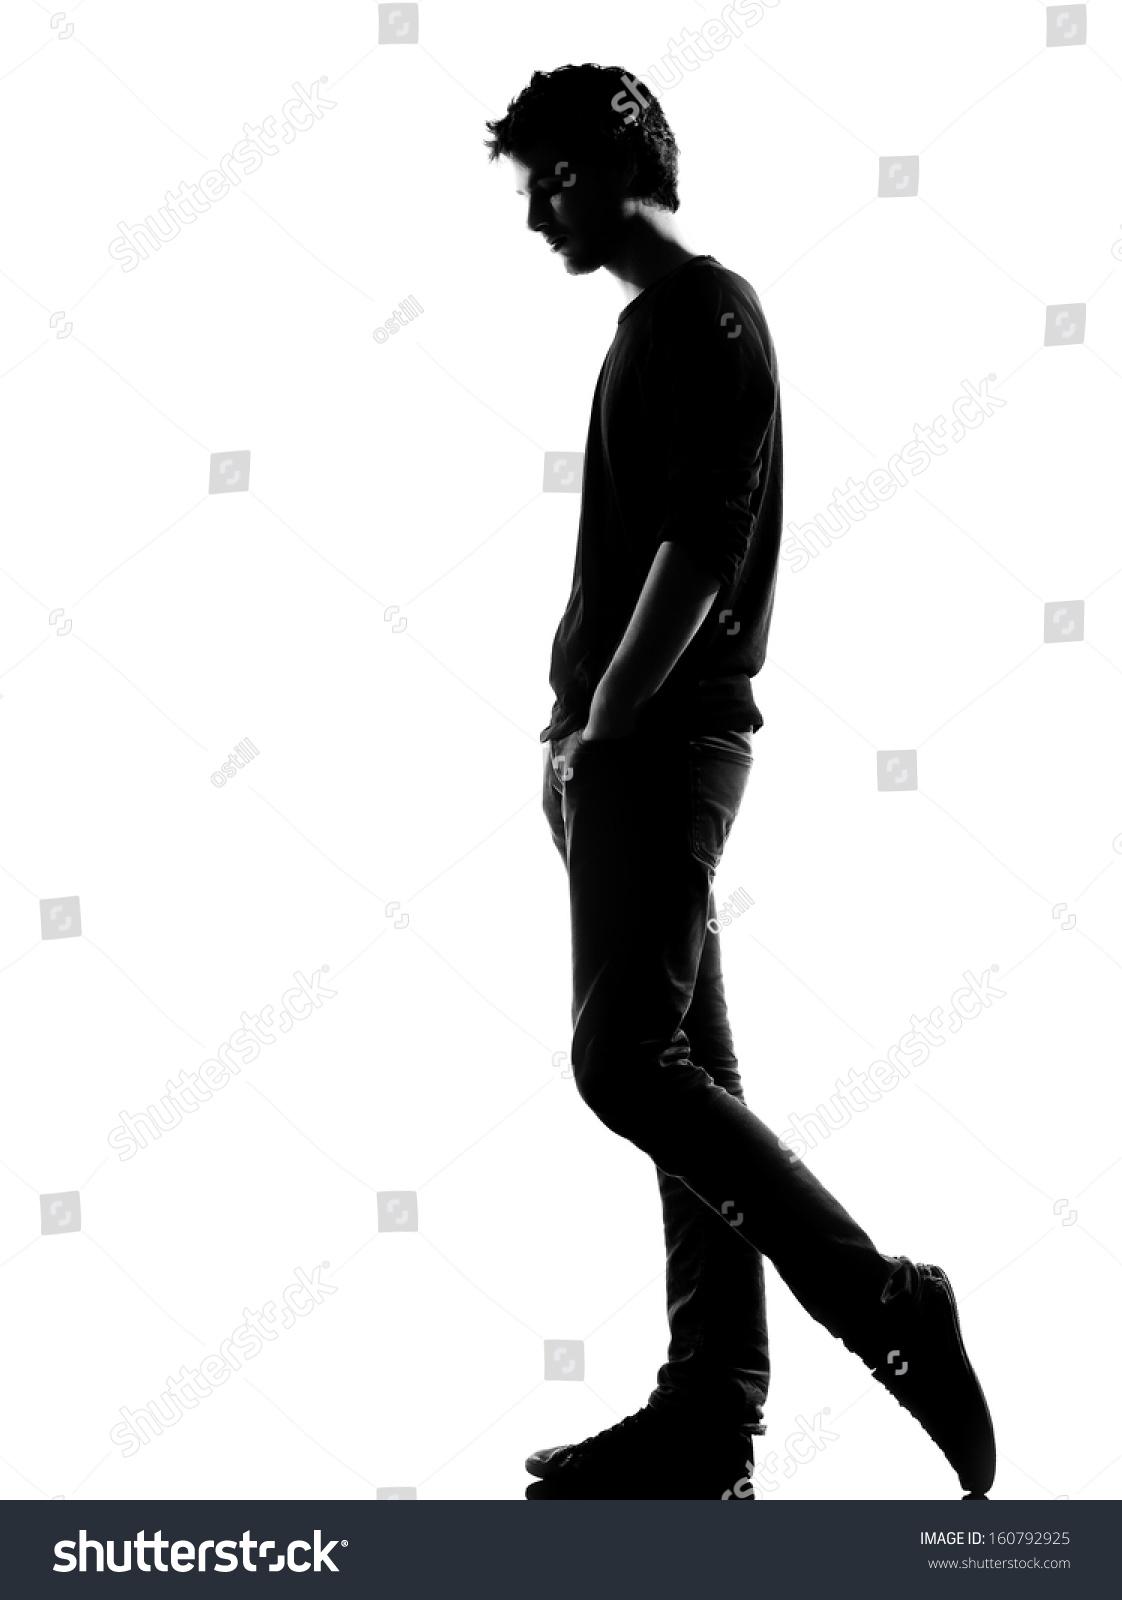 Young Man Sad Walking Silhouette Studio Stock Photo ...   1122 x 1600 jpeg 146kB